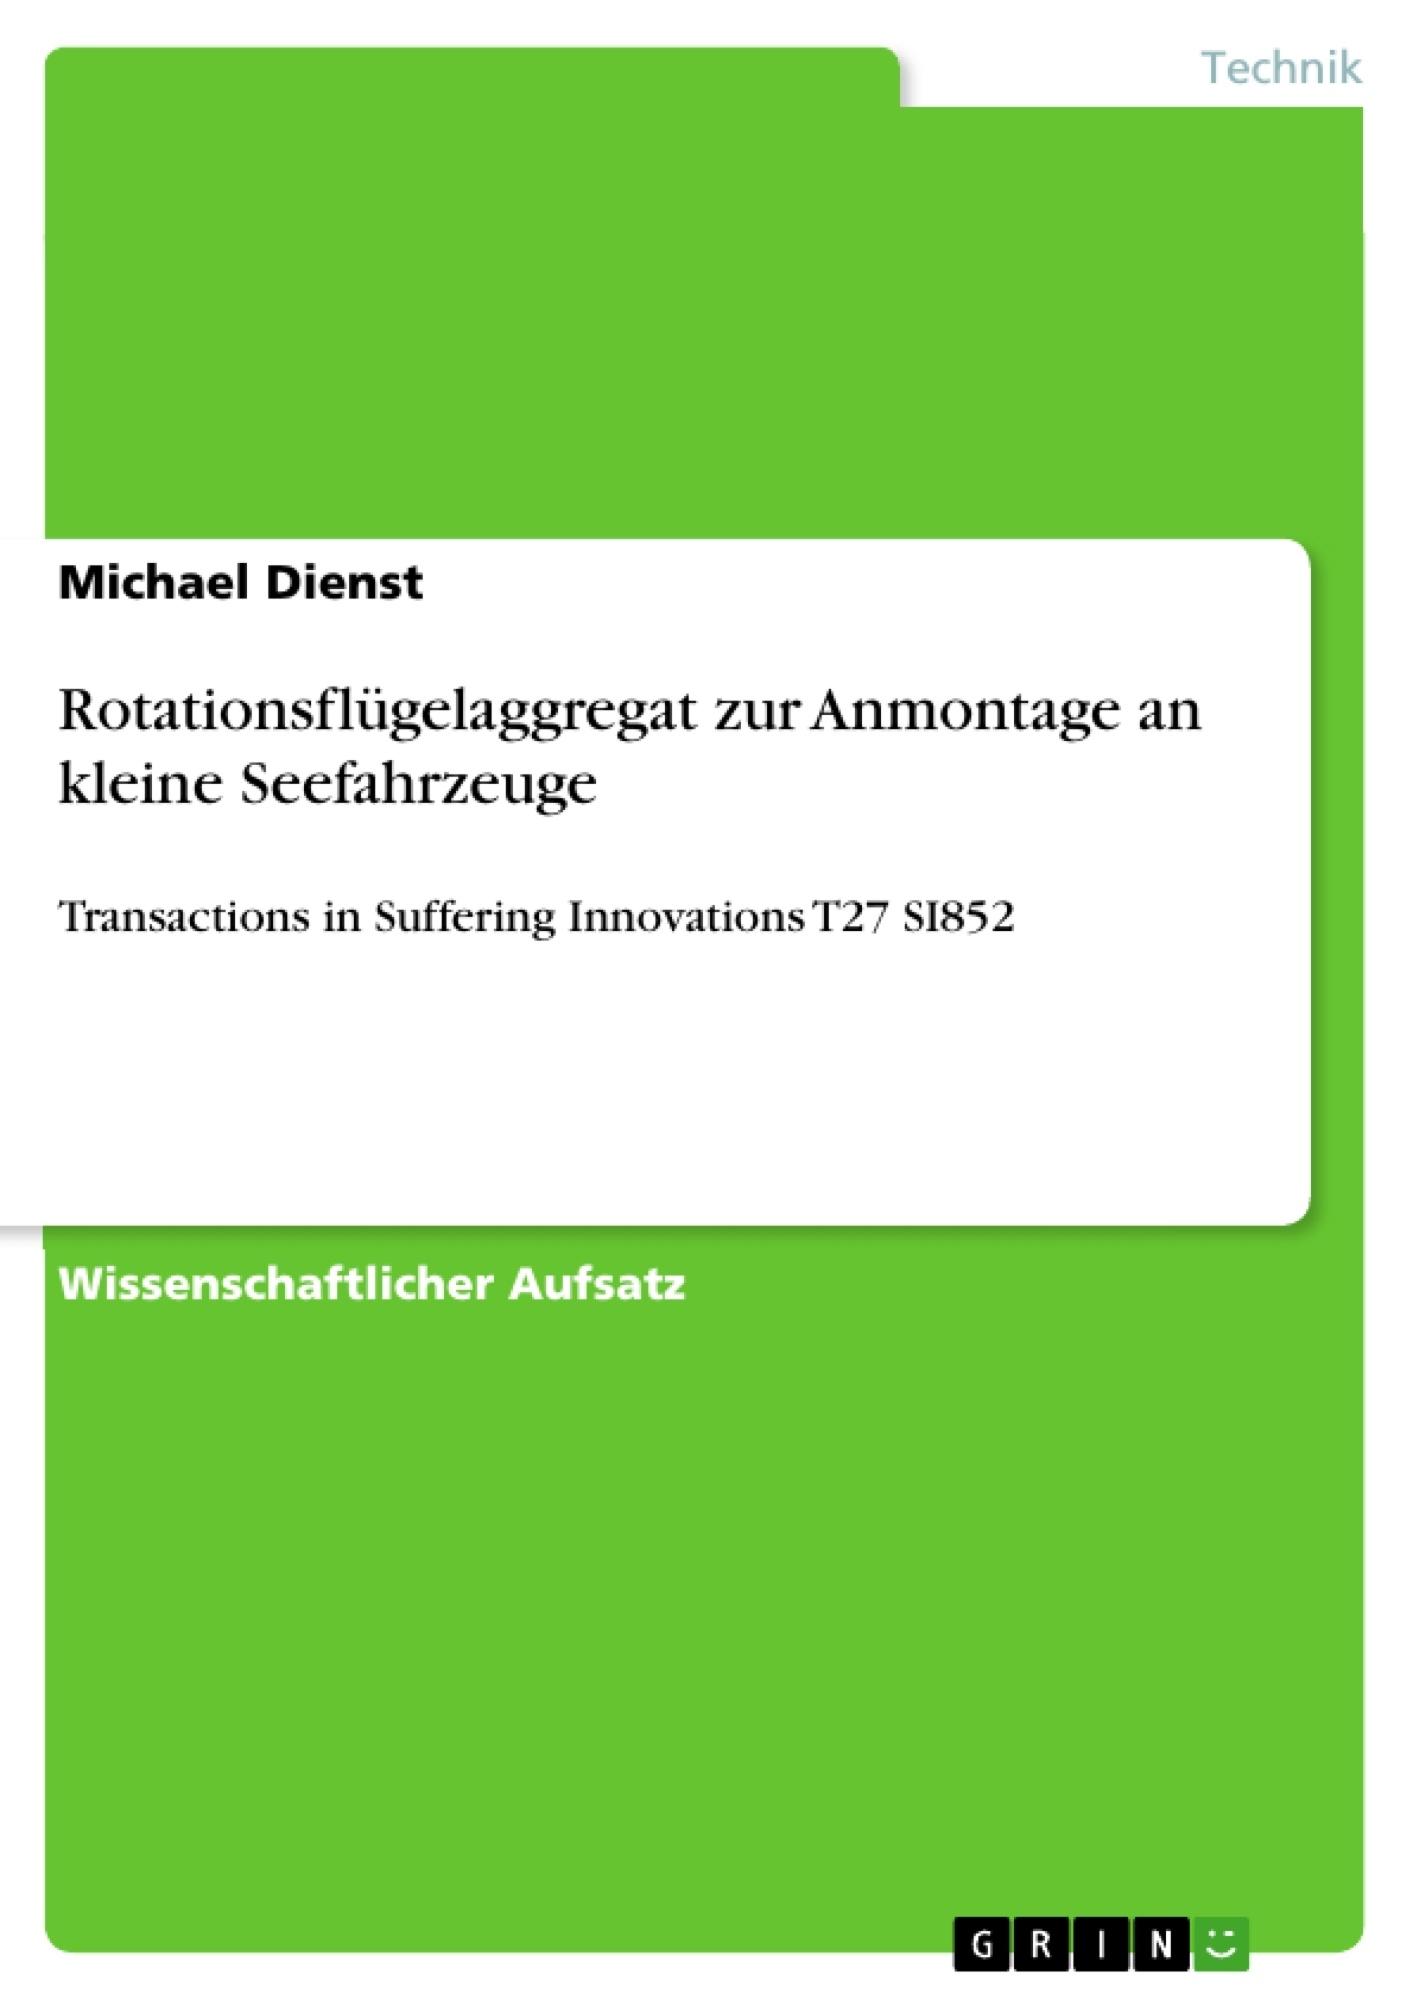 Titel: Rotationsflügelaggregat zur Anmontage an kleine Seefahrzeuge